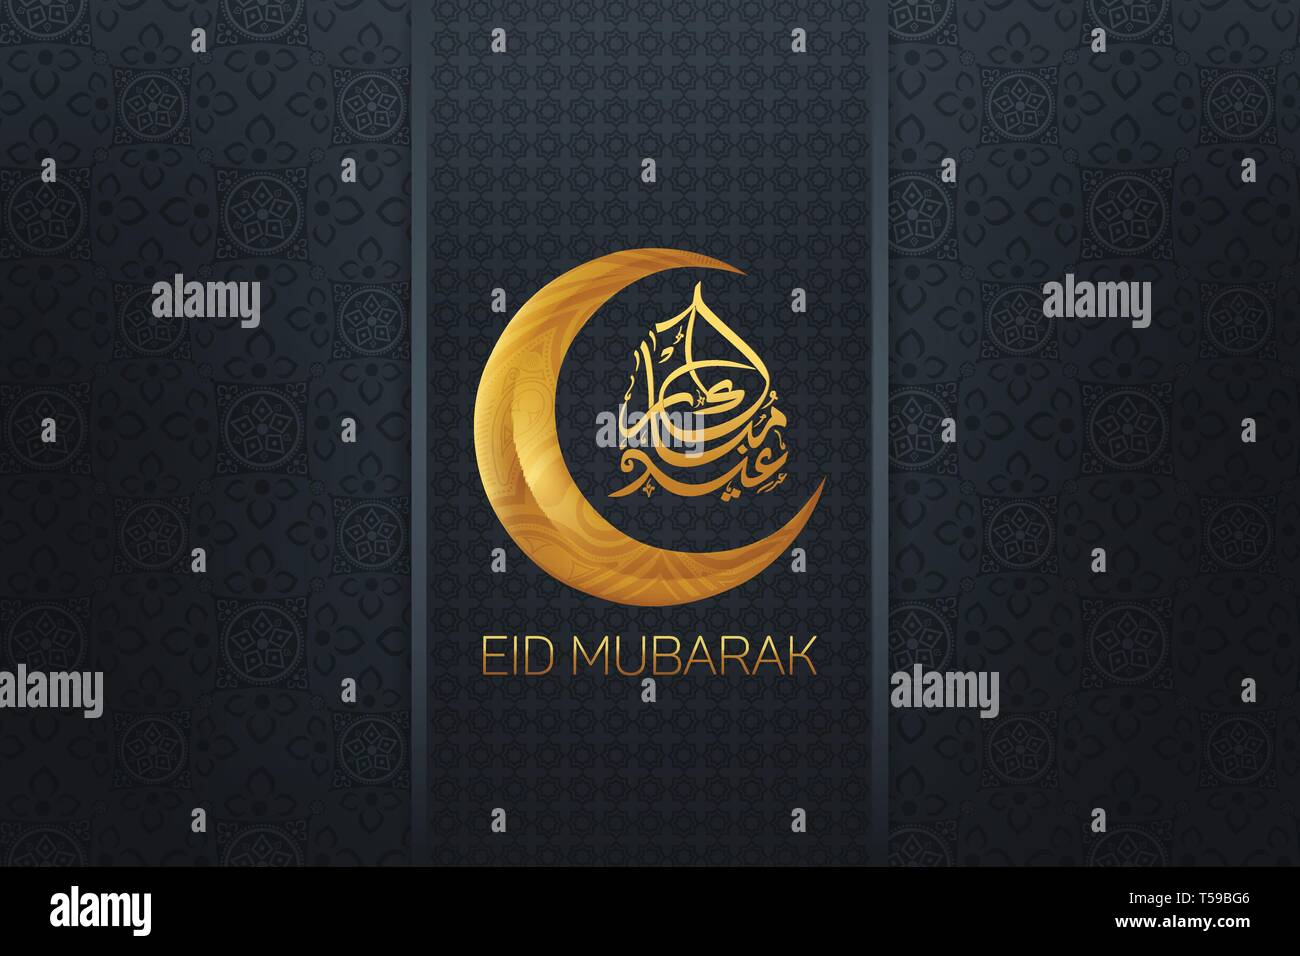 Eid Mubarak Arabic Calligraphy Vector Illustration Background Stock Vector Image Art Alamy